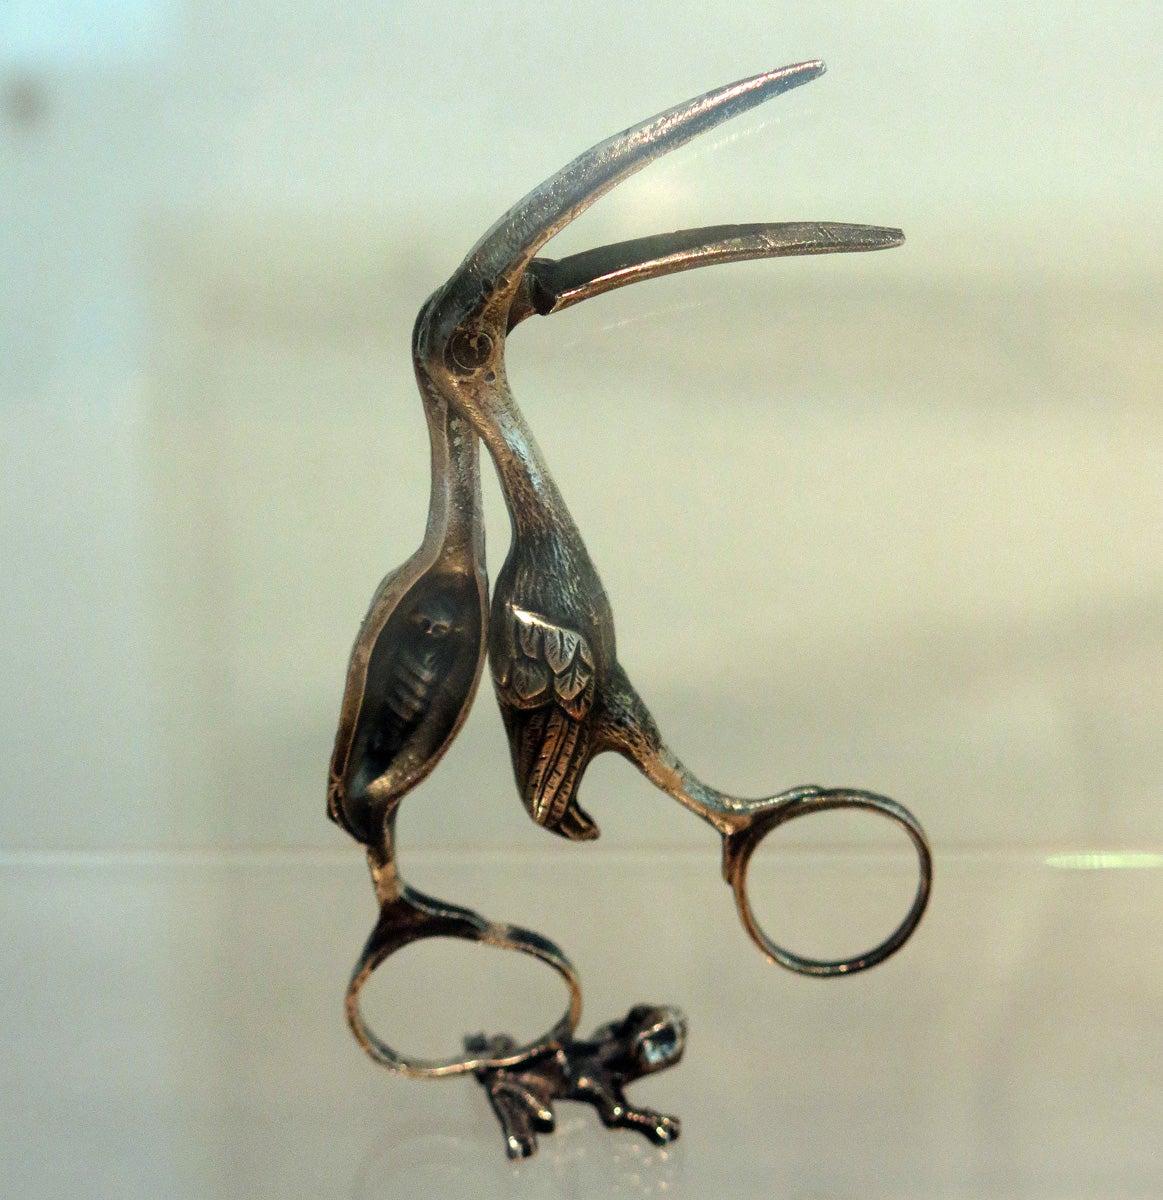 The Extraordinary Evolution of Scissors